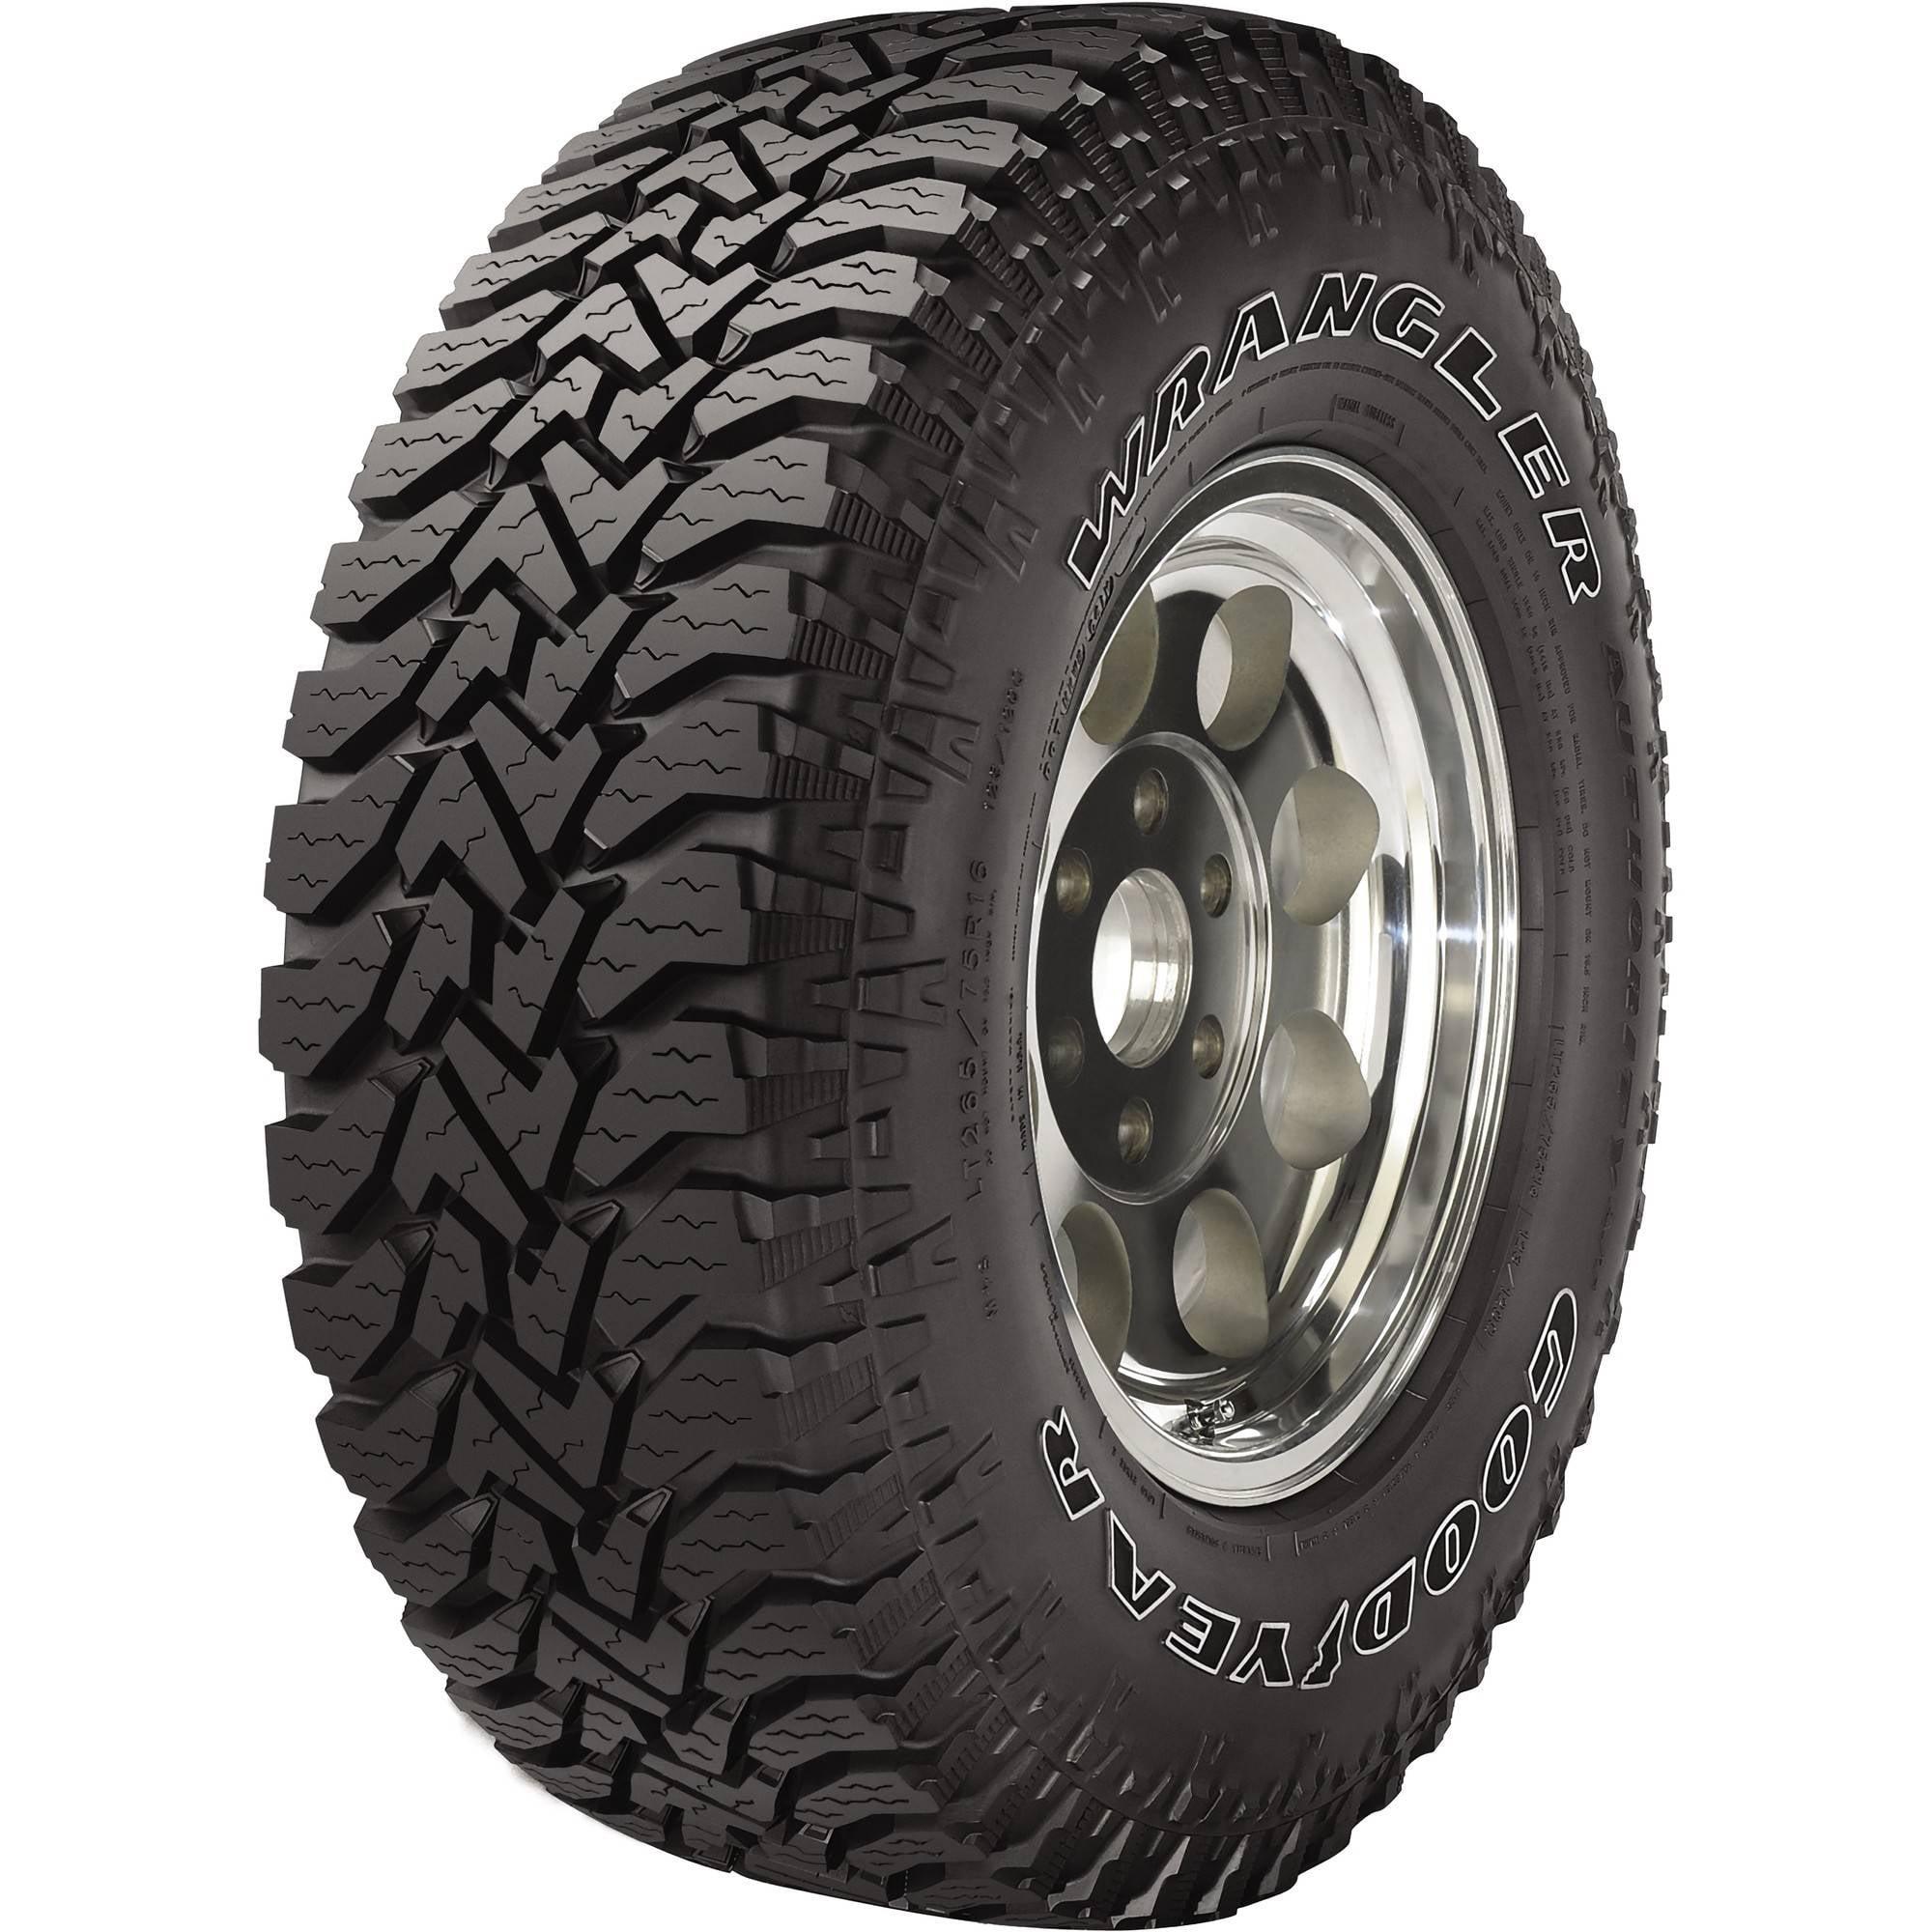 Snow Tires Winter Tires Goodyear Tires >> Goodyear Wrangler Authority Tire 31x10 50r15 Lt Walmart Com